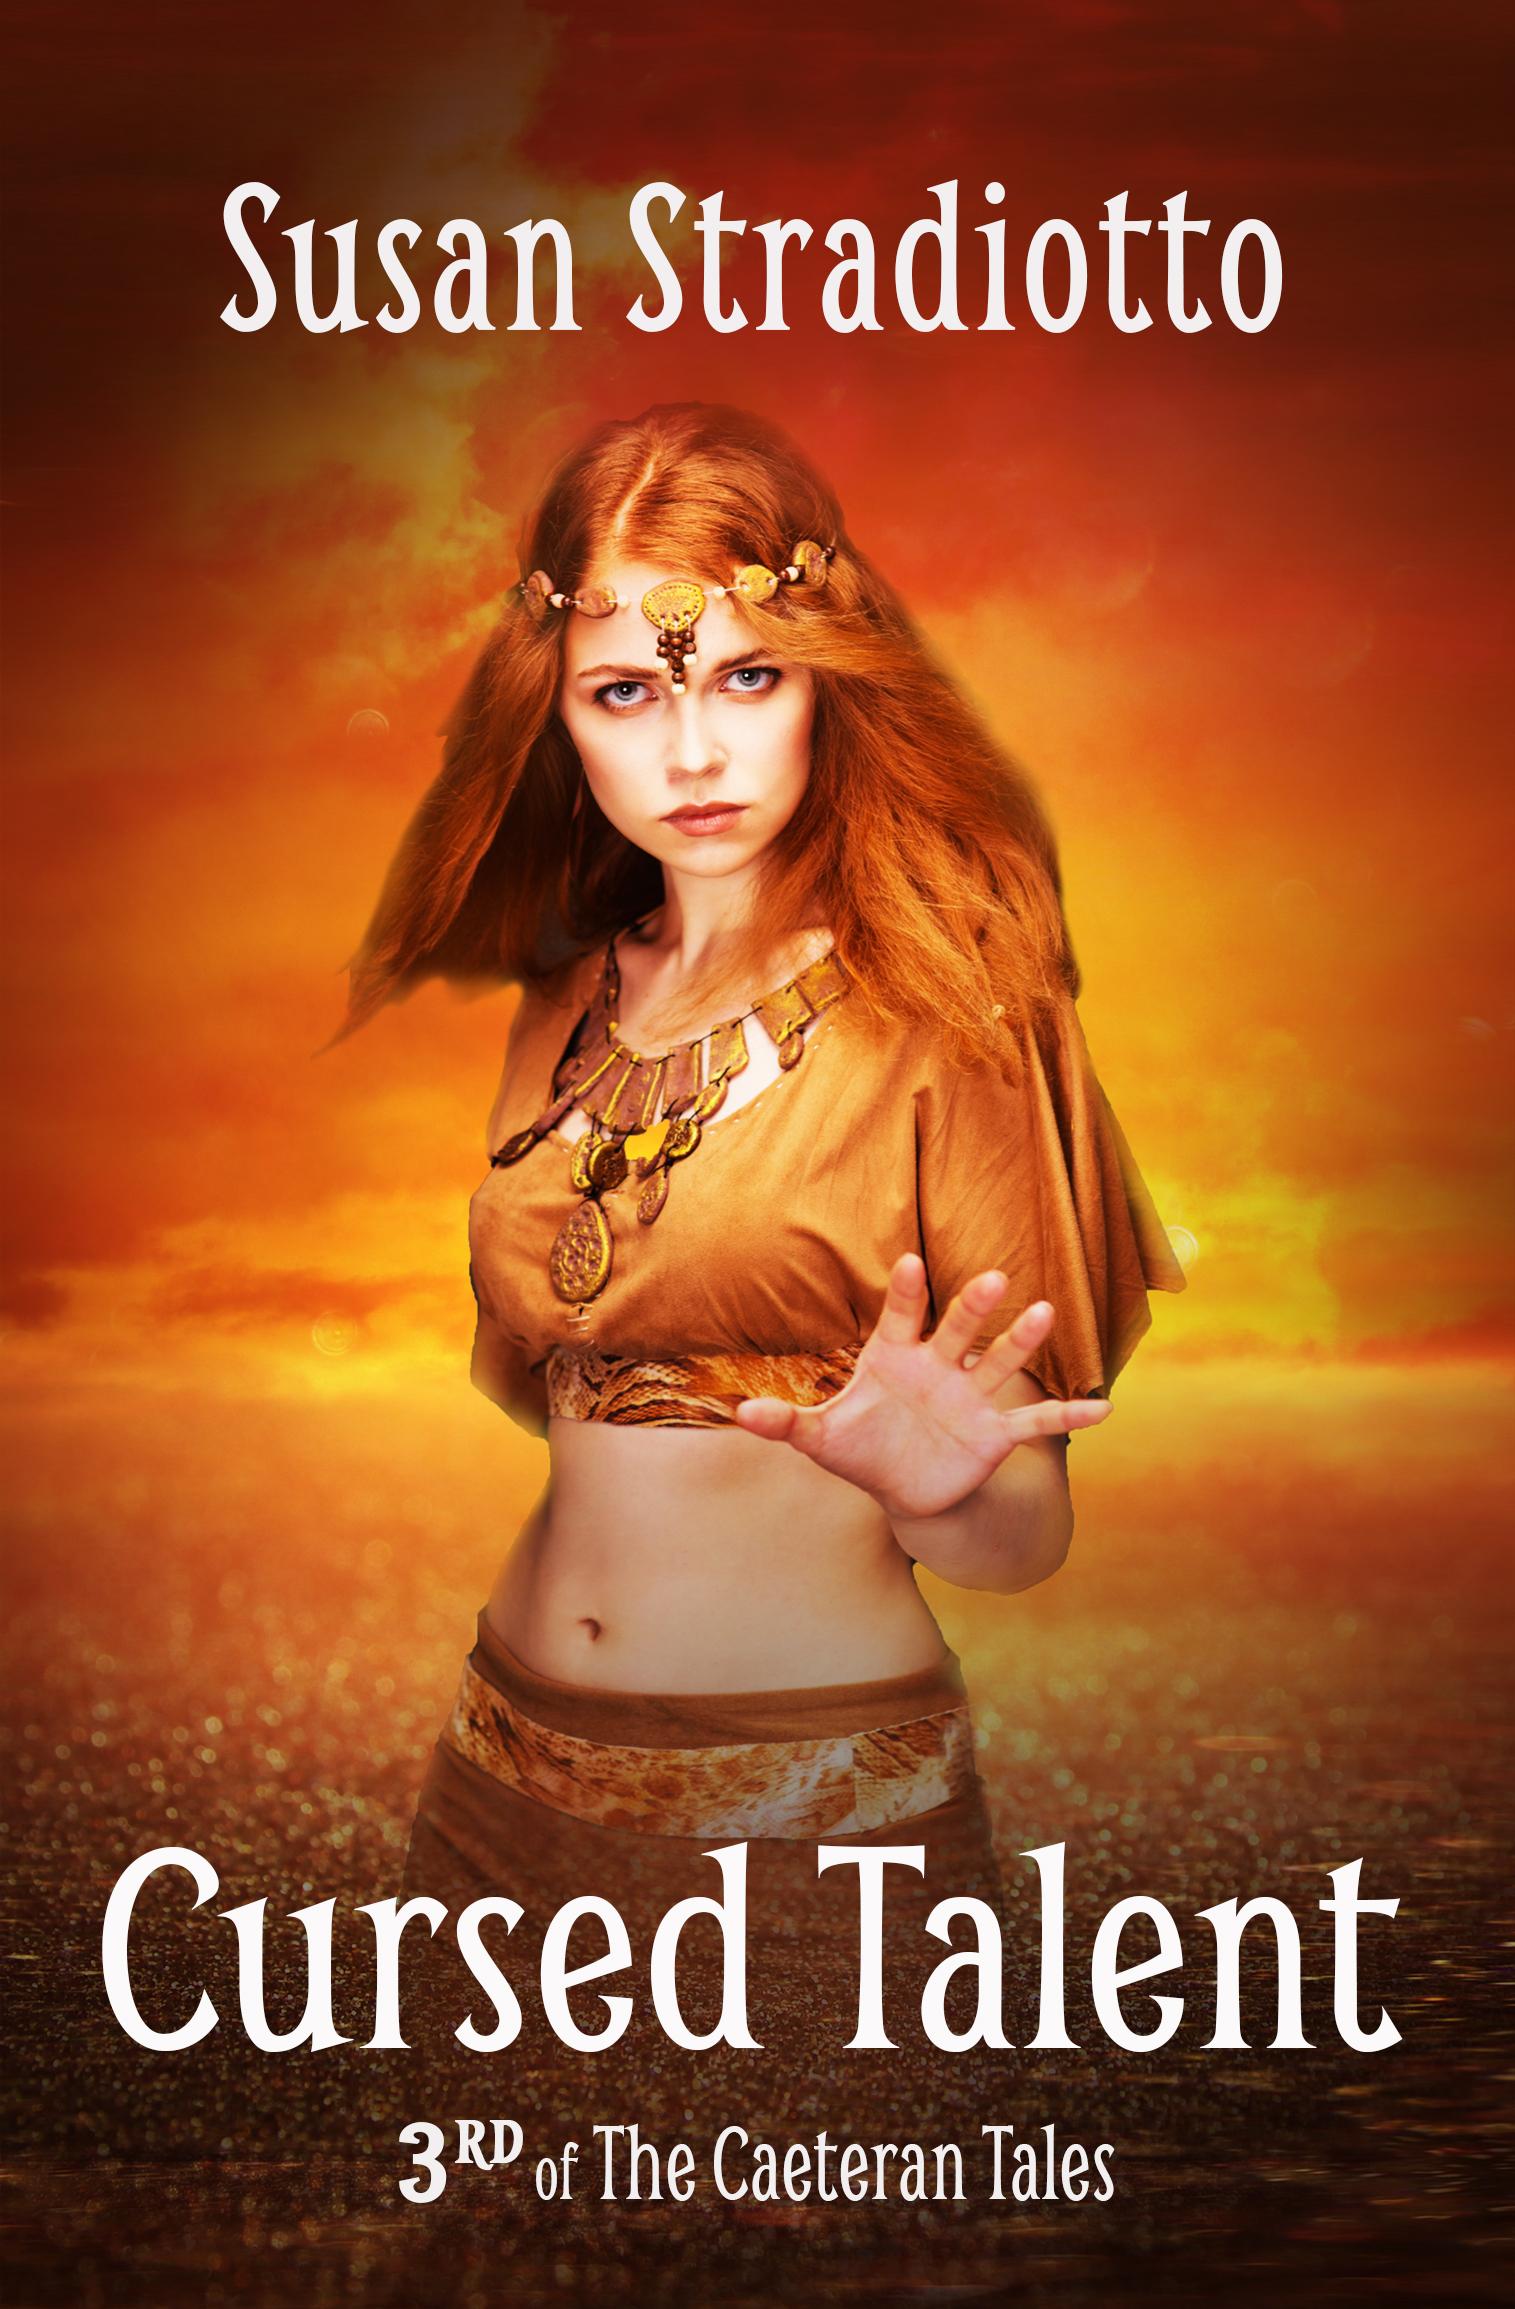 Cursed Talent, 3rd of the Caeteran Tales